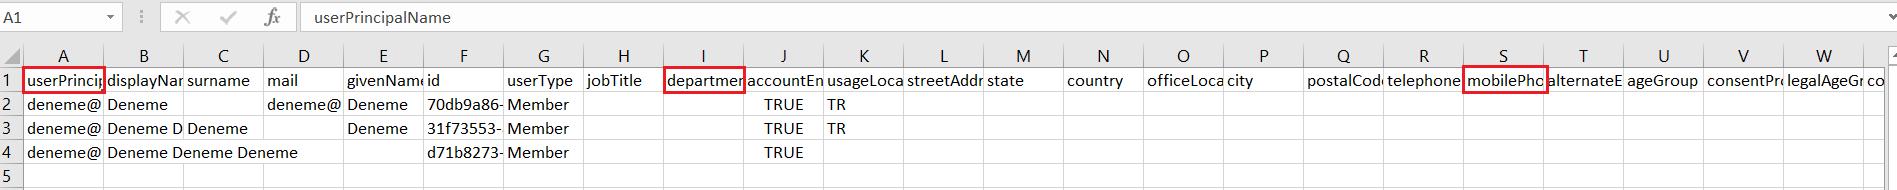 3-edit_list